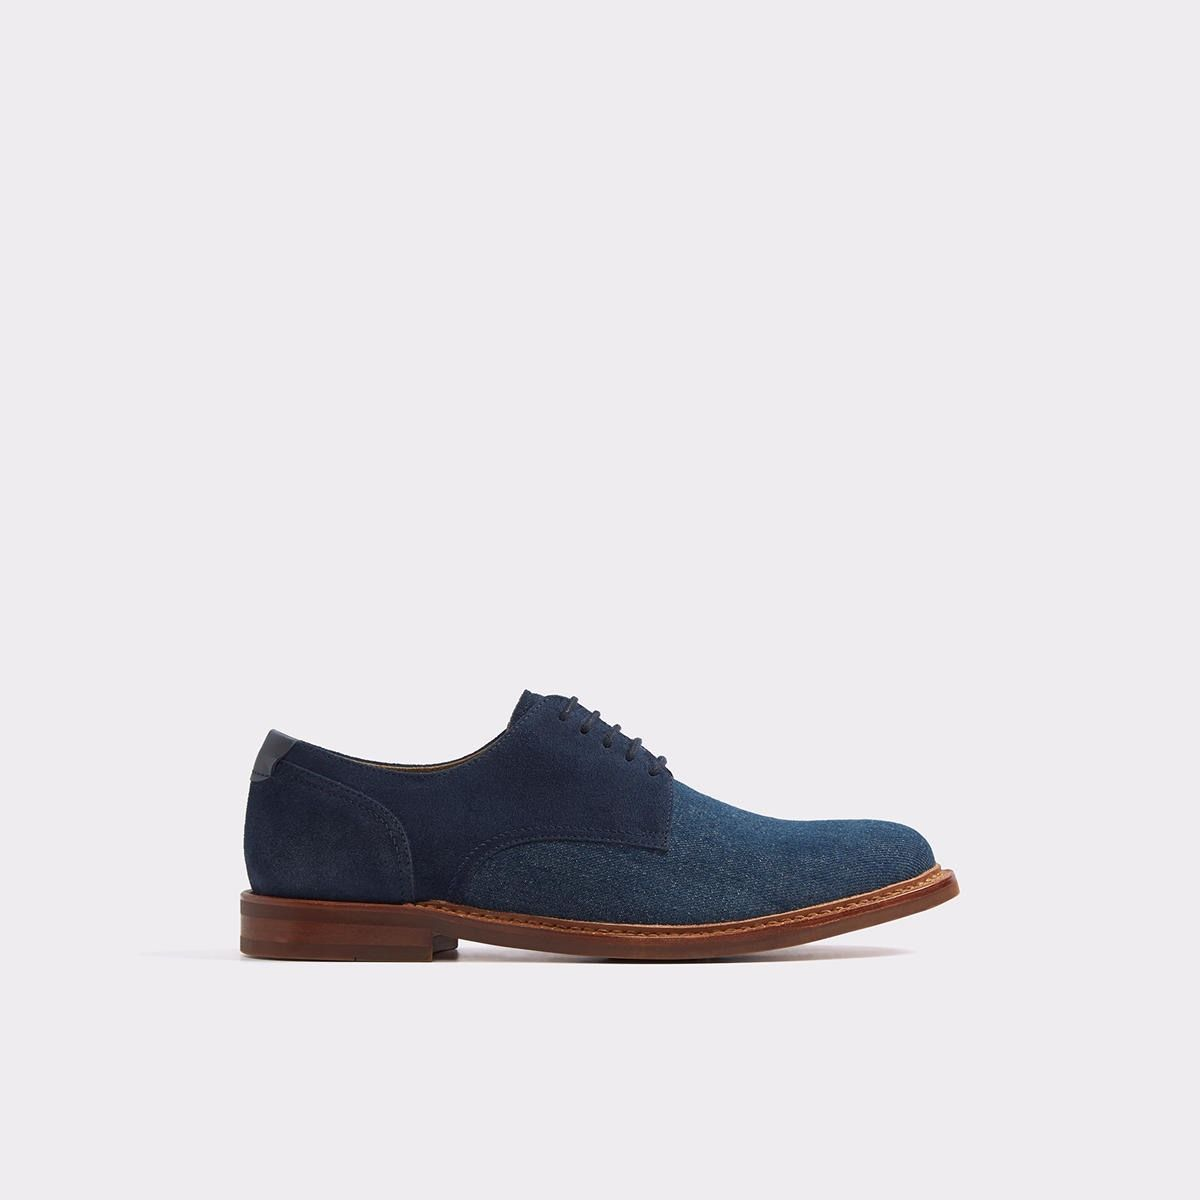 db3f94c41c0 Uleradien Navy Men s Dress shoes